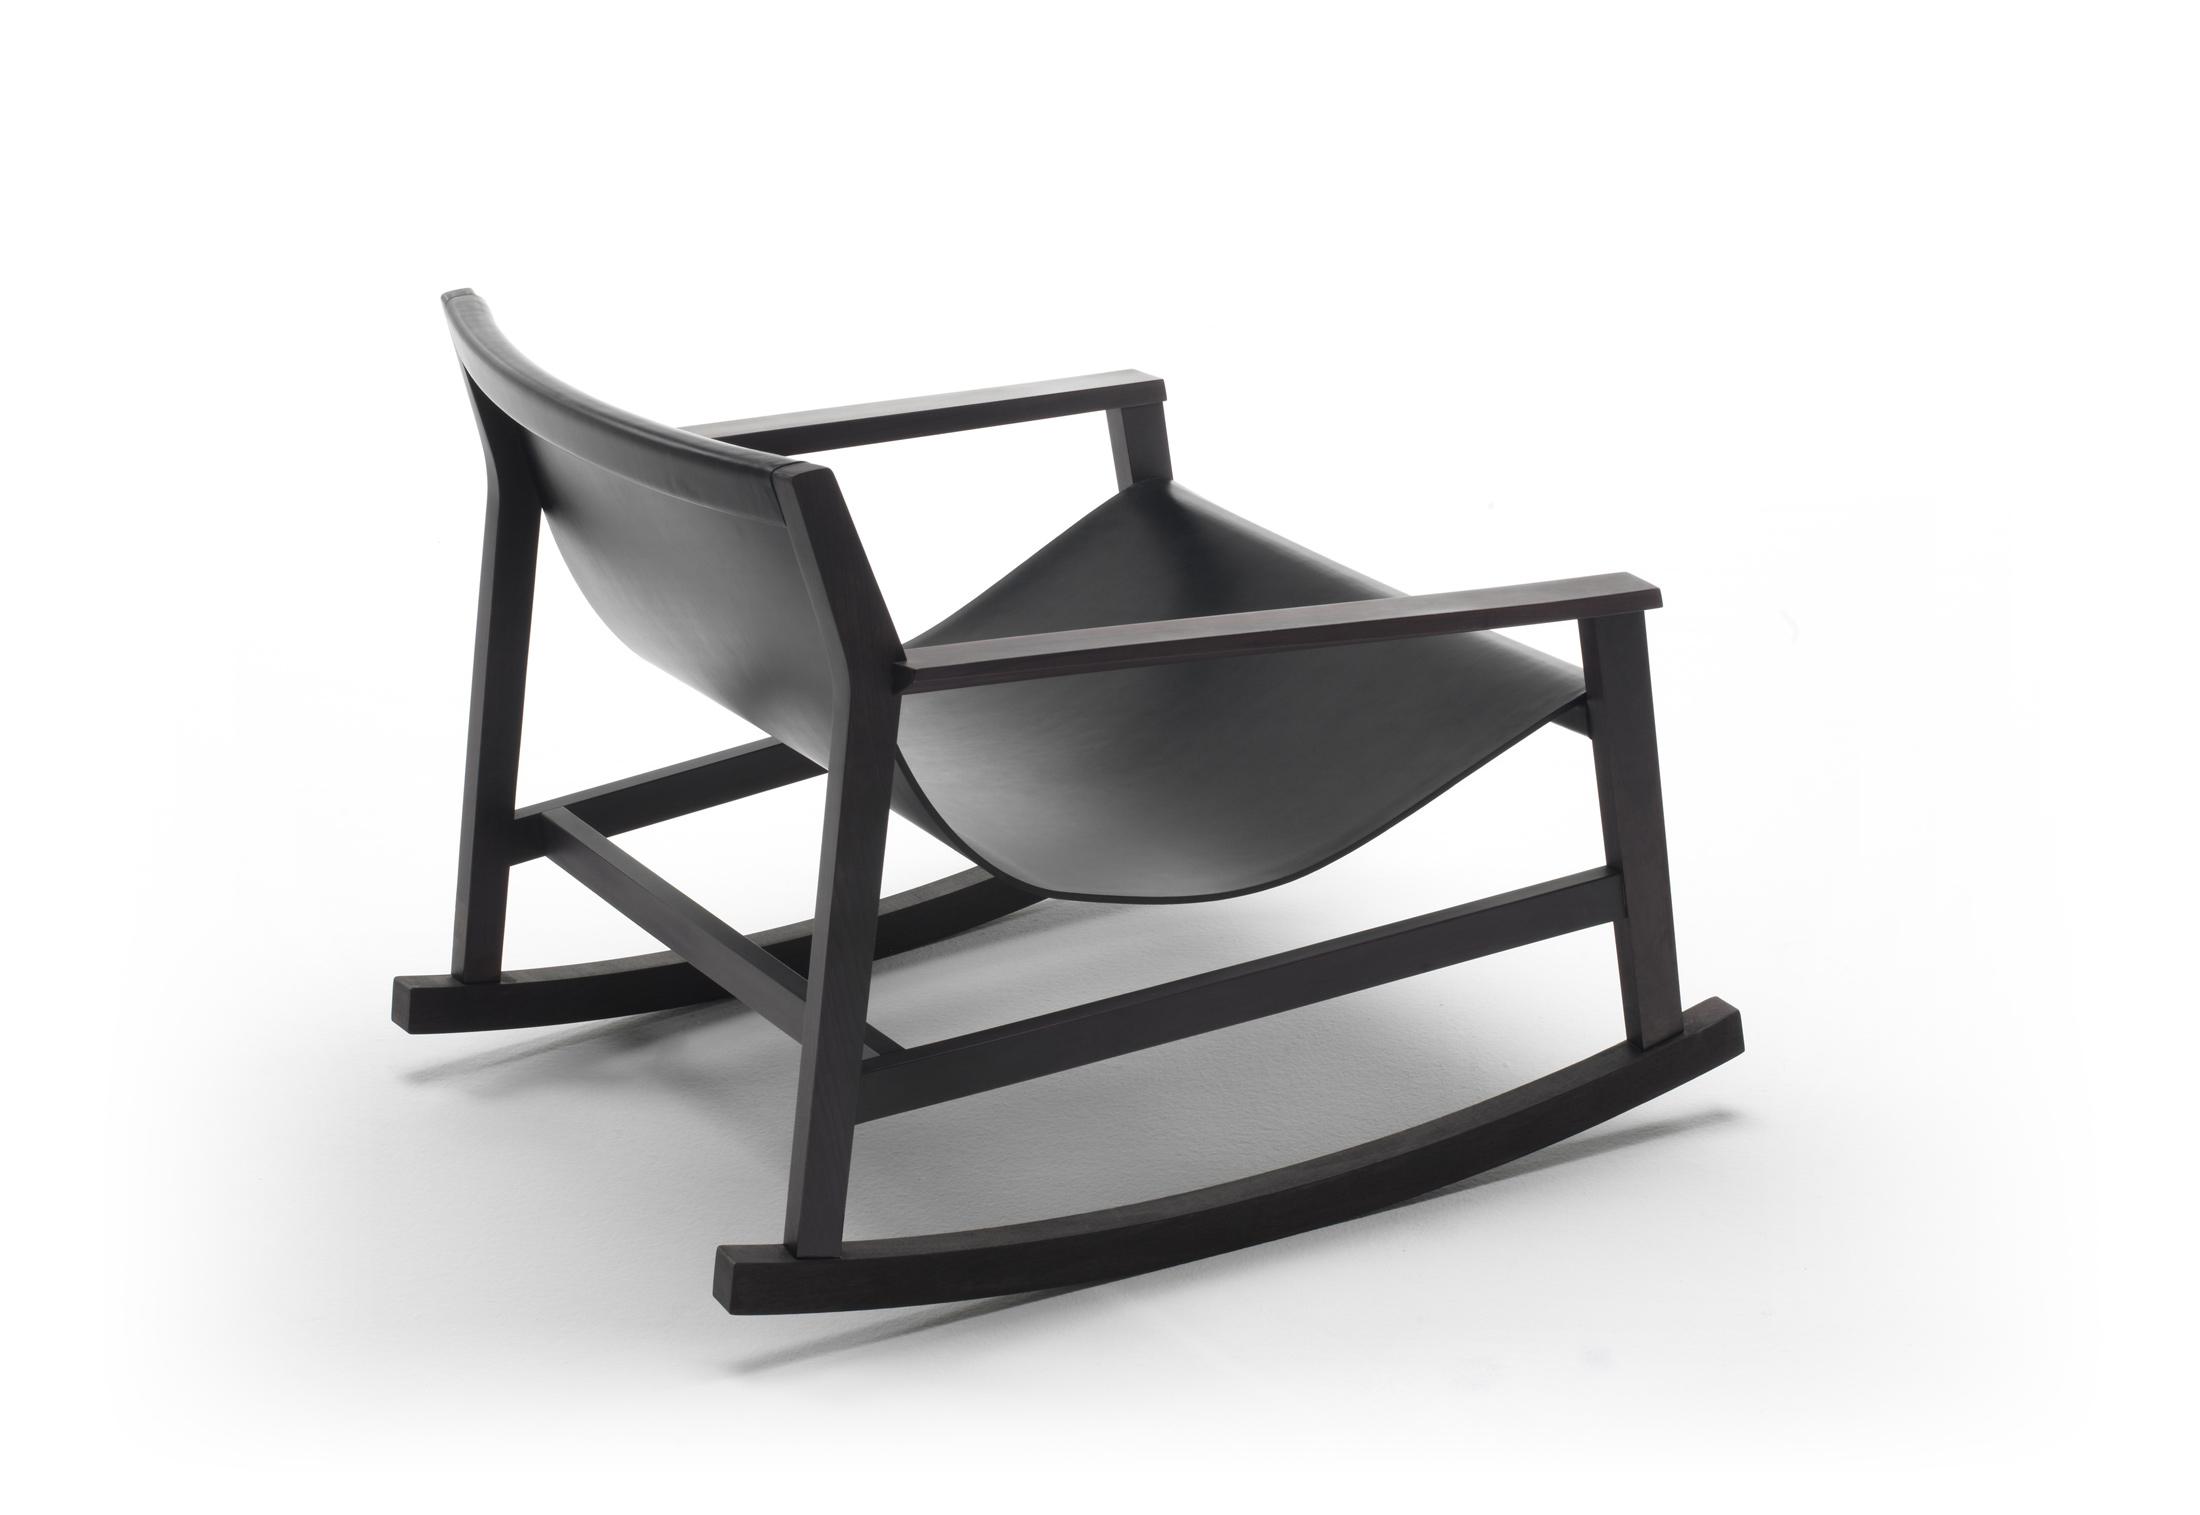 dondolo von living divani stylepark. Black Bedroom Furniture Sets. Home Design Ideas